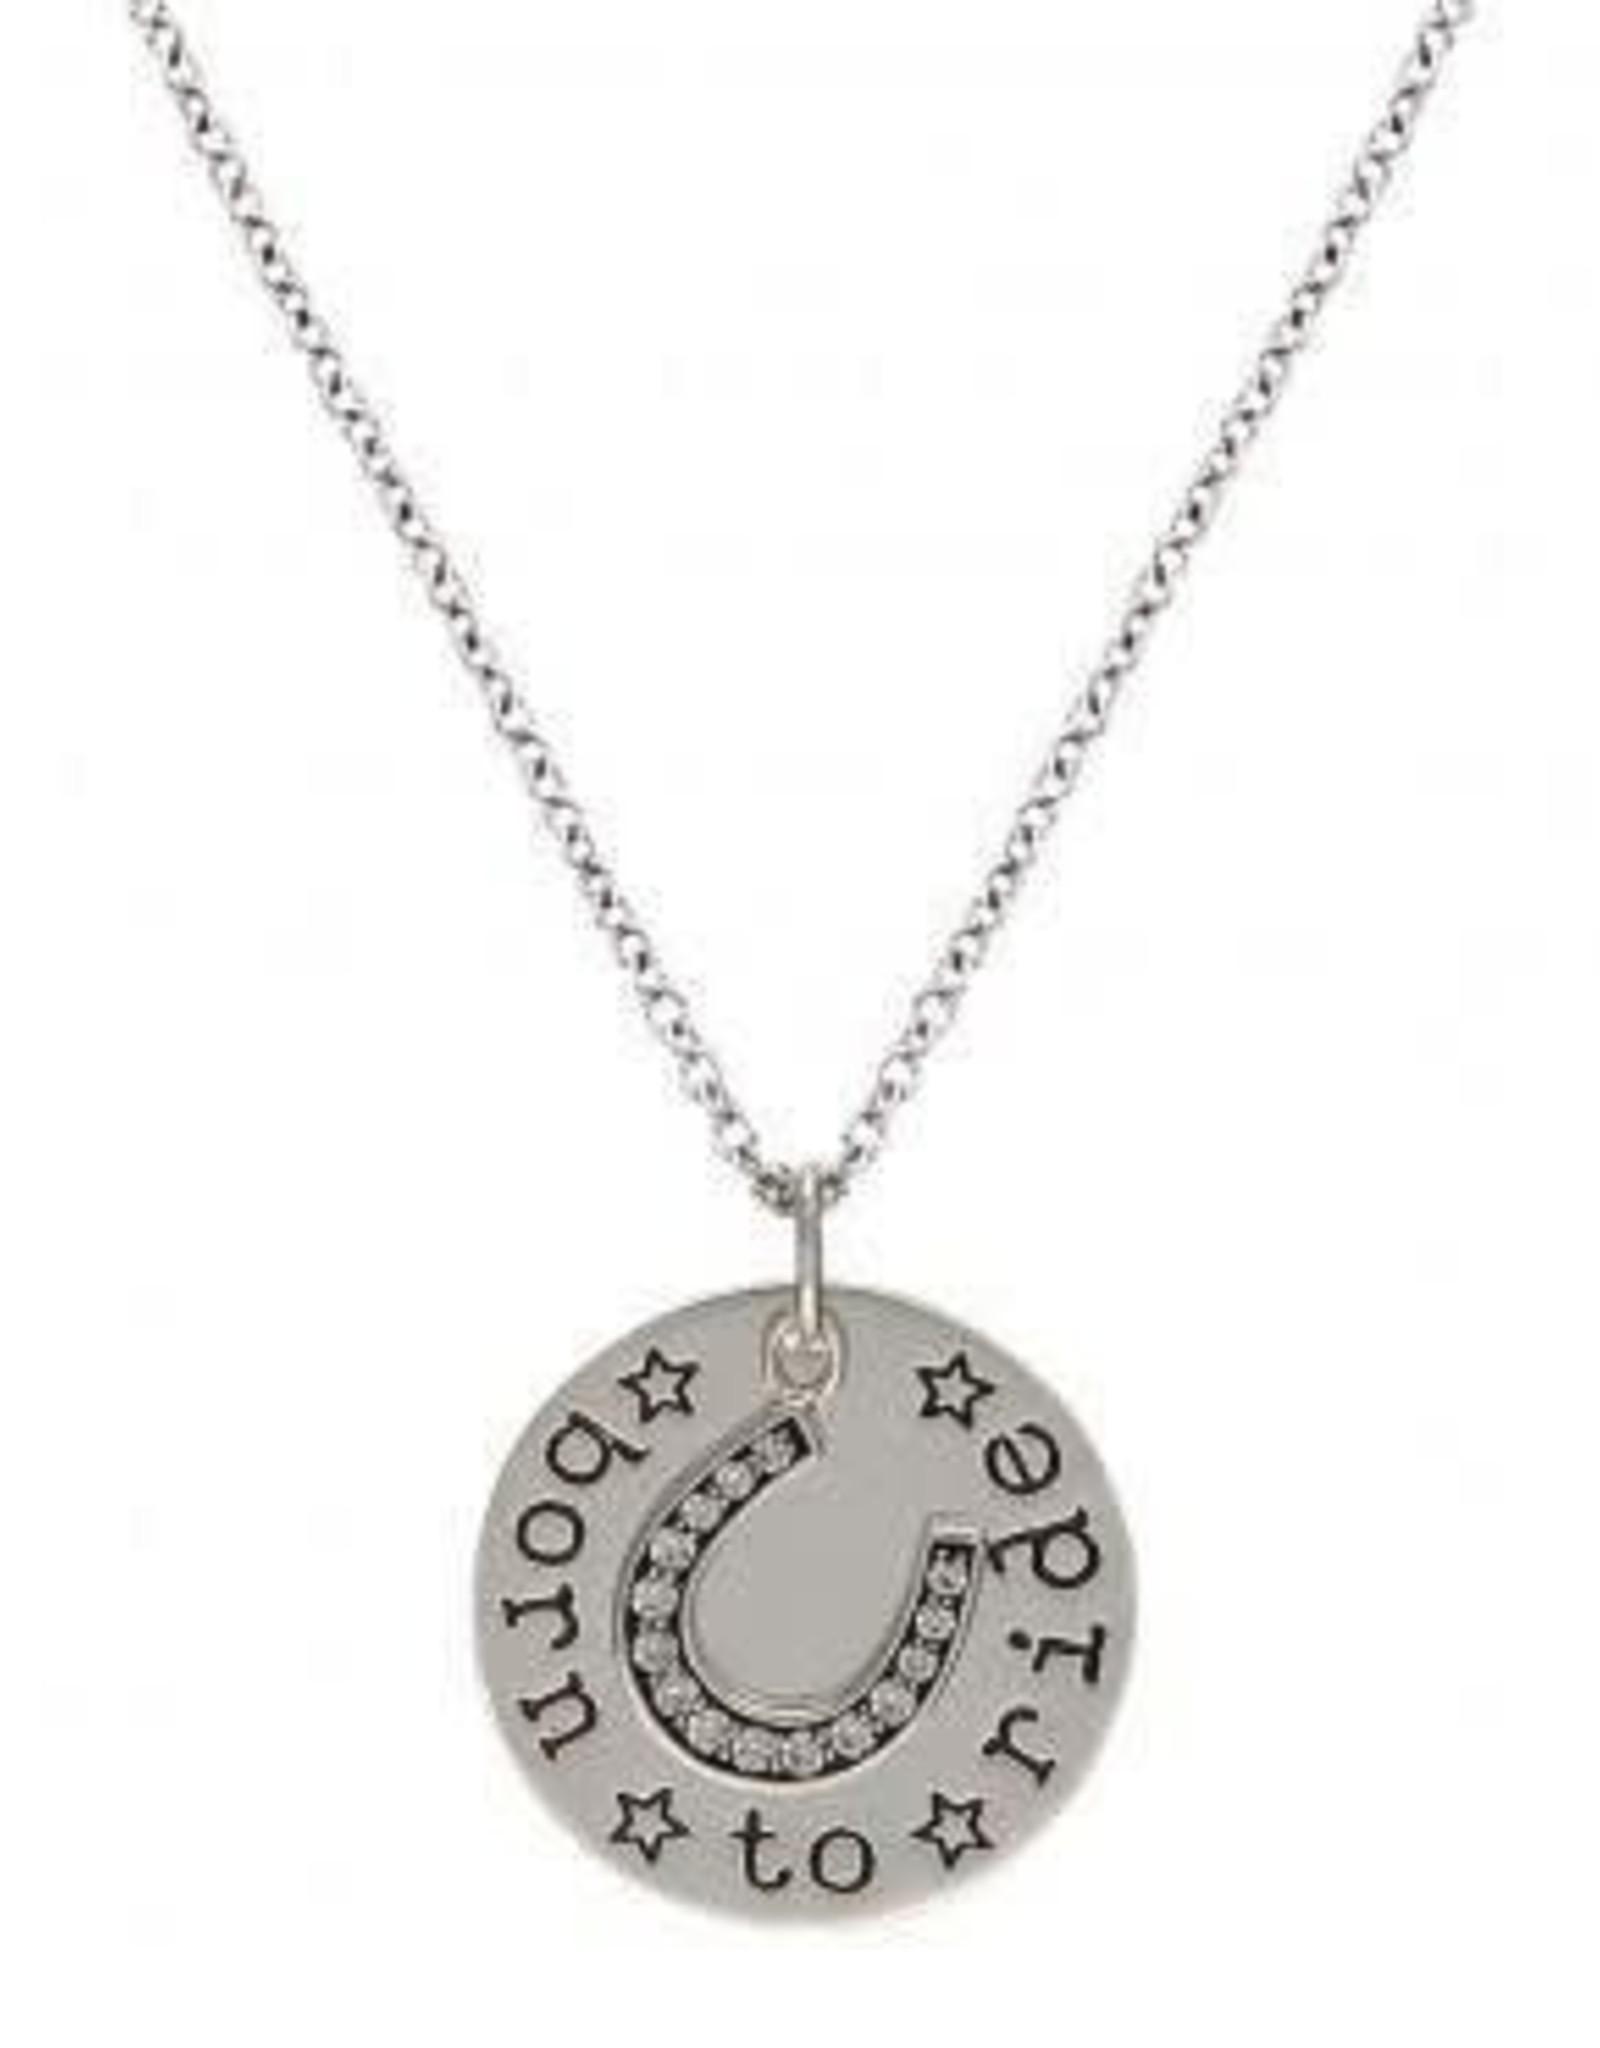 Montana Silversmiths Coin Charm Born to Ride NC2197